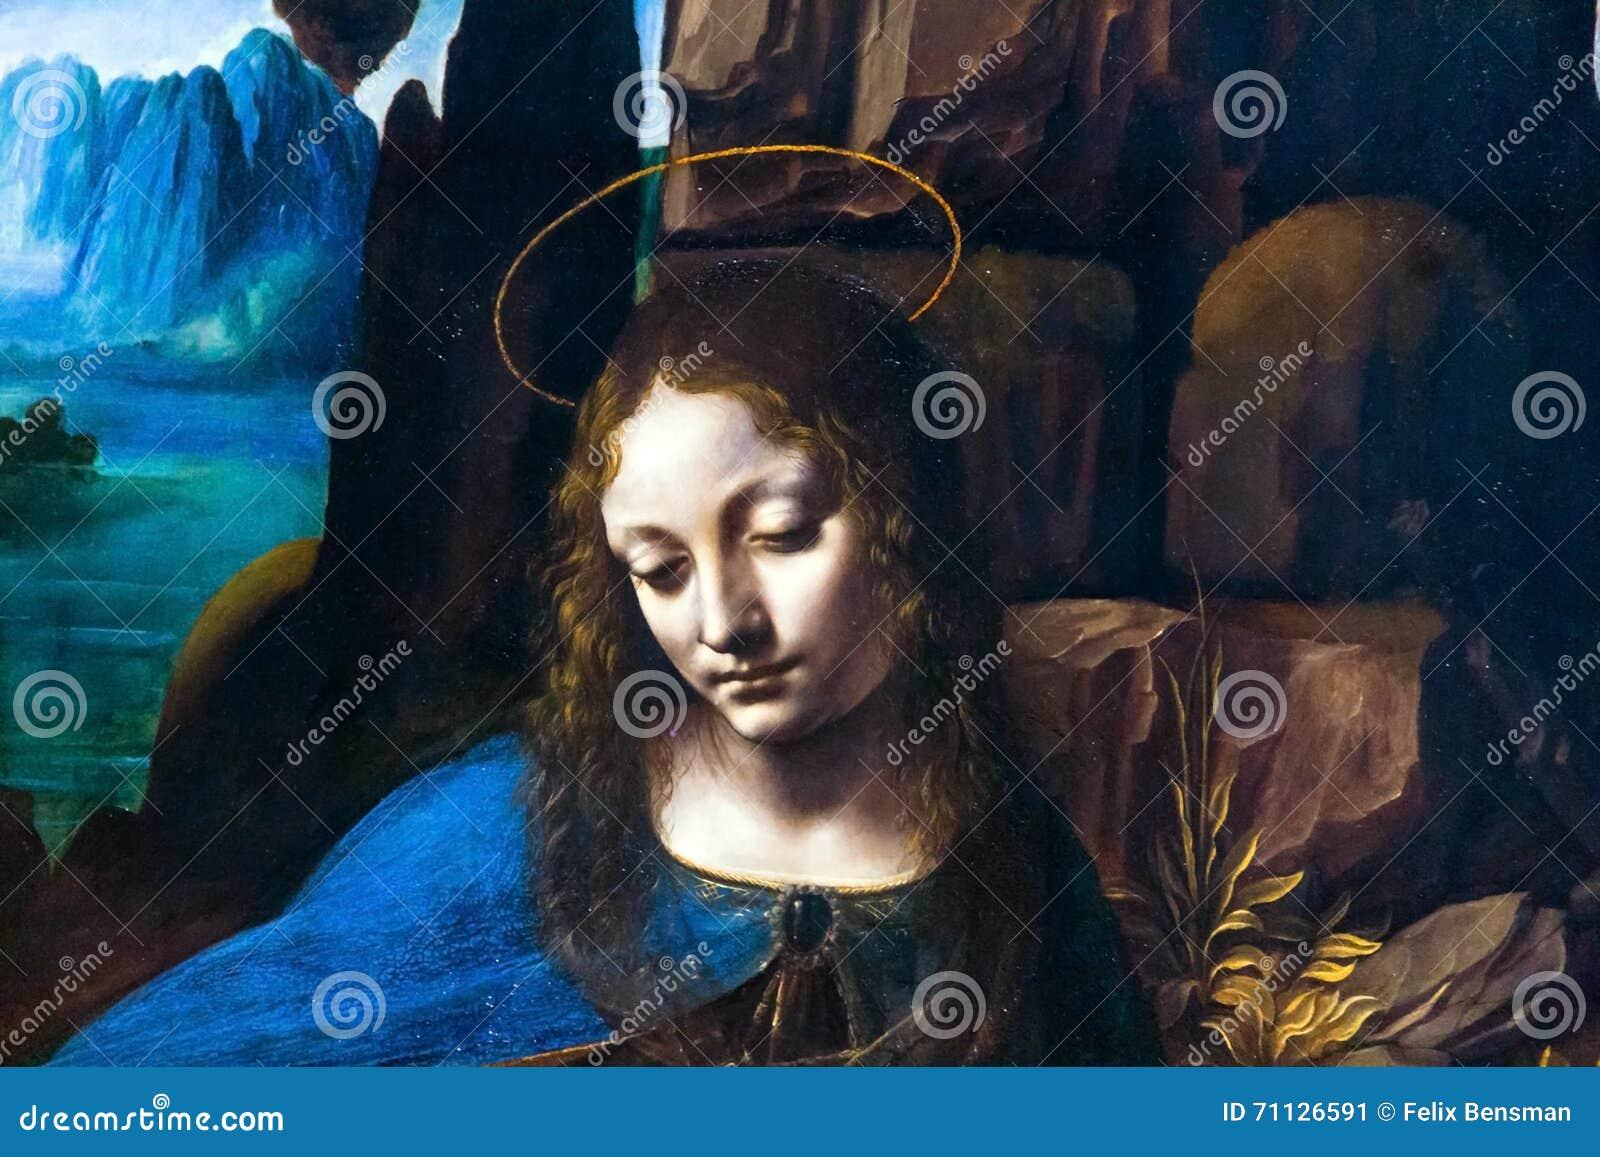 detail of the virgin of the rock by leonardo da vinciat